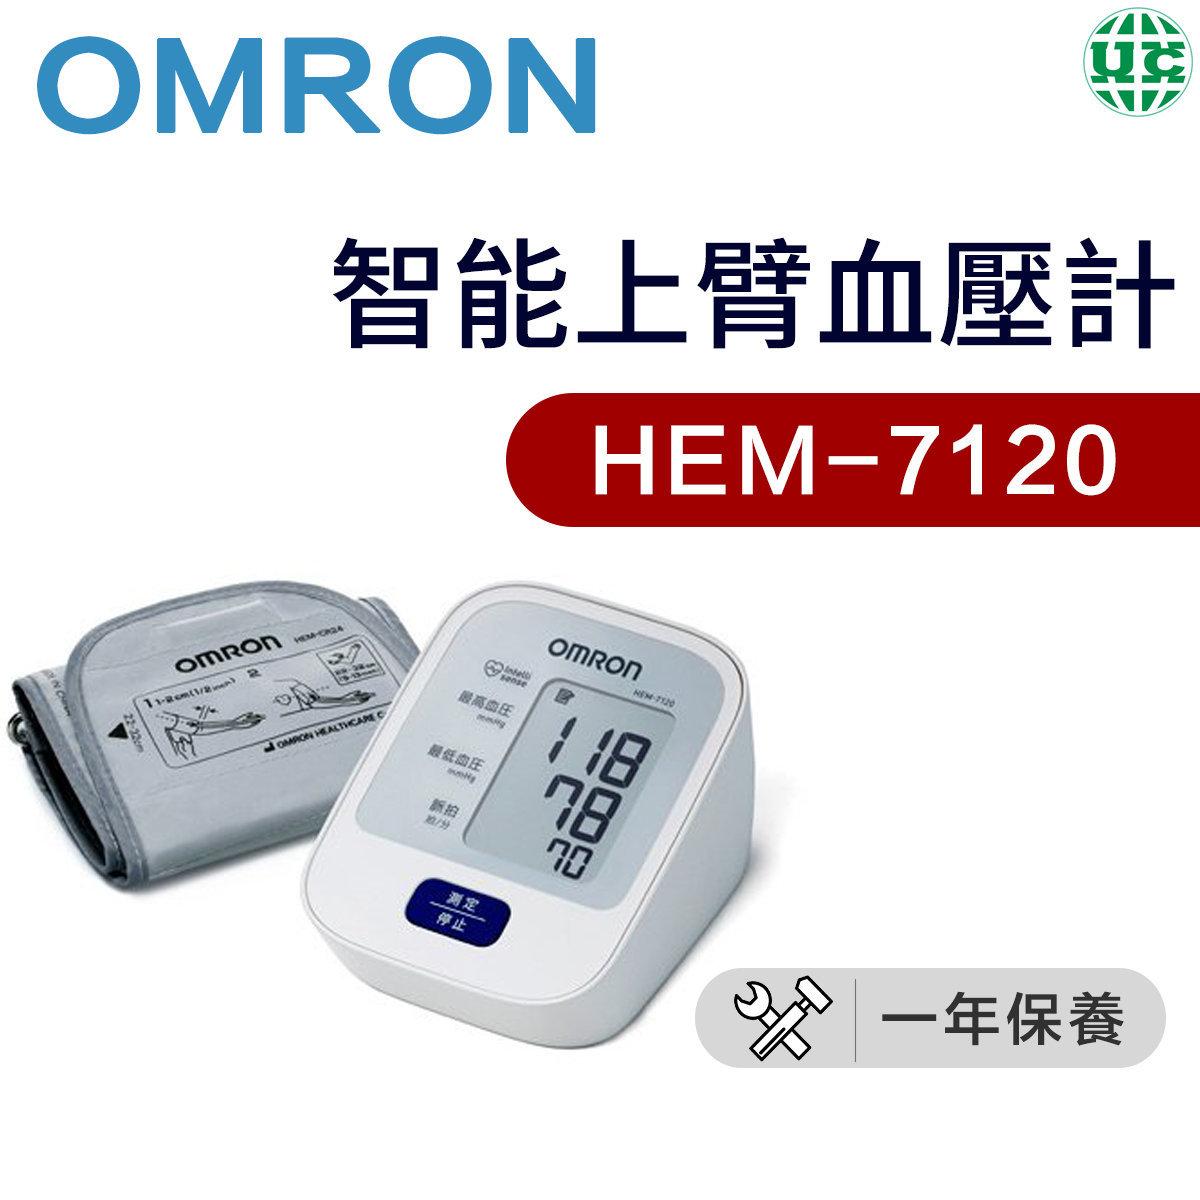 HEM-7120 上臂式血壓計(平行進口)